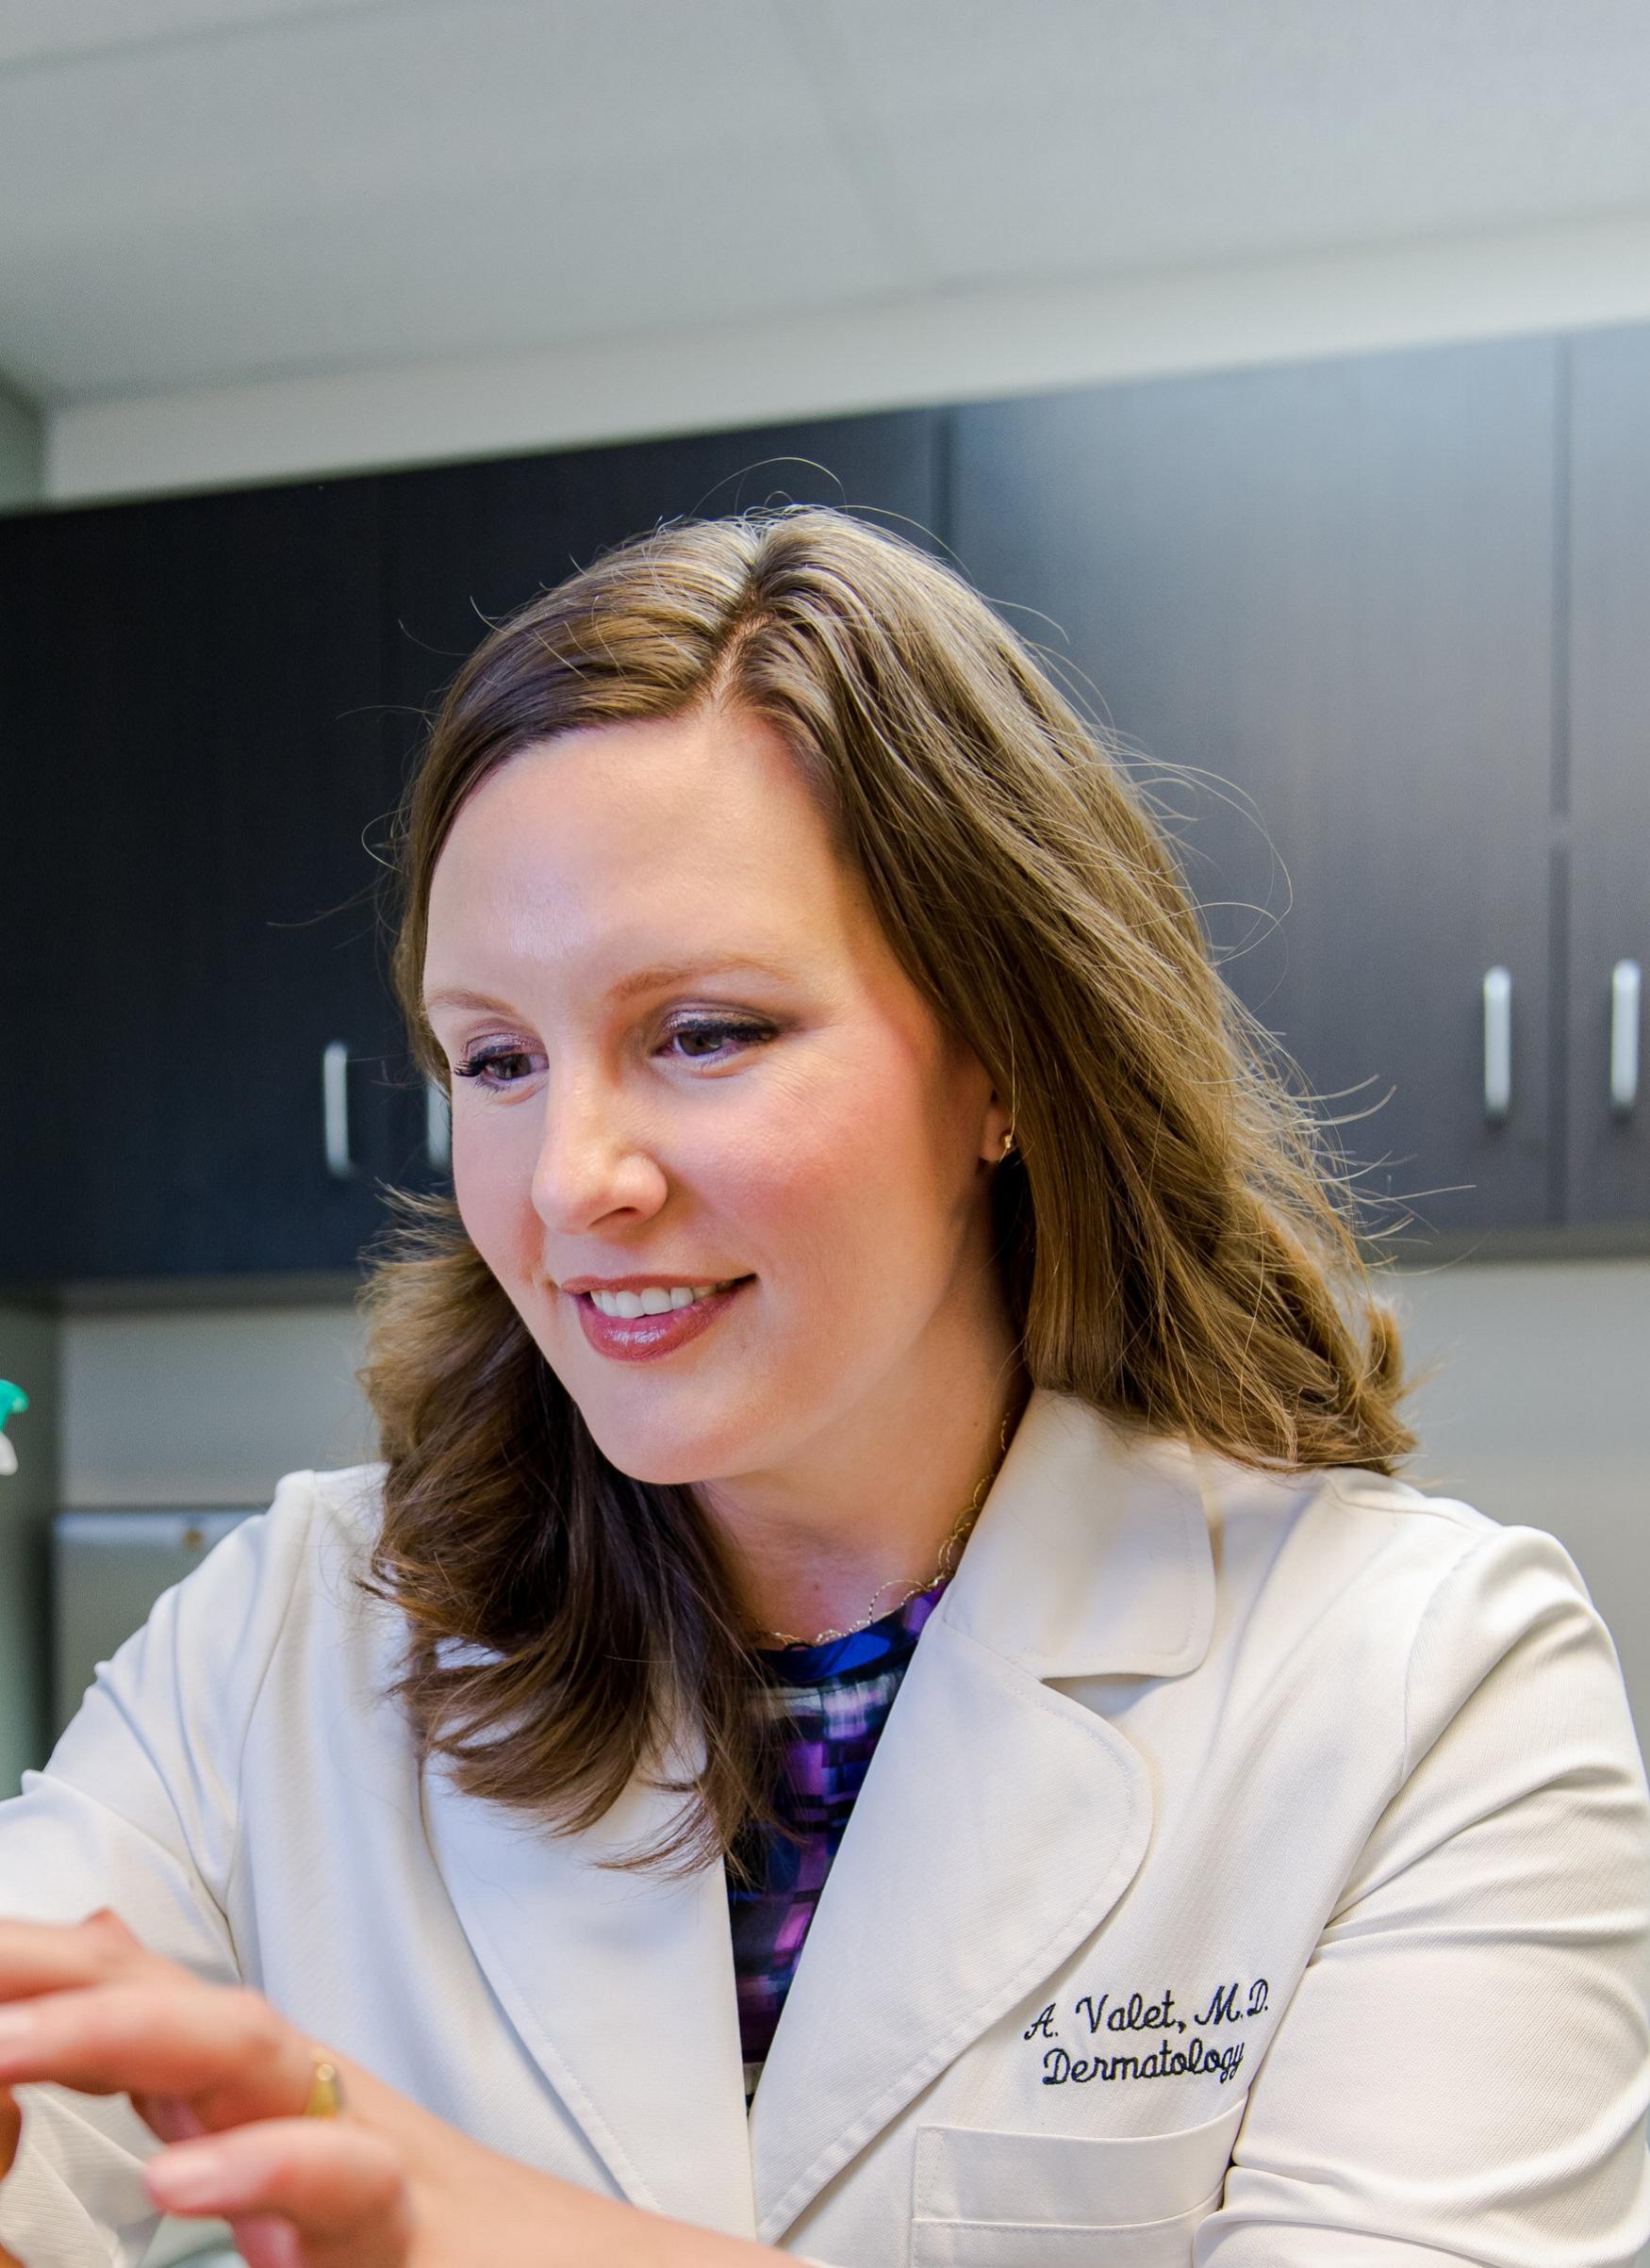 Dr. Amy Valet Nashville dermatologist, best dermatologist in Nashville, Amy Valet MD dermatologist, Amy Valet MD dermatology, traceside dermatology, Juvederm, Botox, Restylane, Lyft, Refyne, Defyne, Dysport, Voluma, Volbella, Vollure, Radiesse